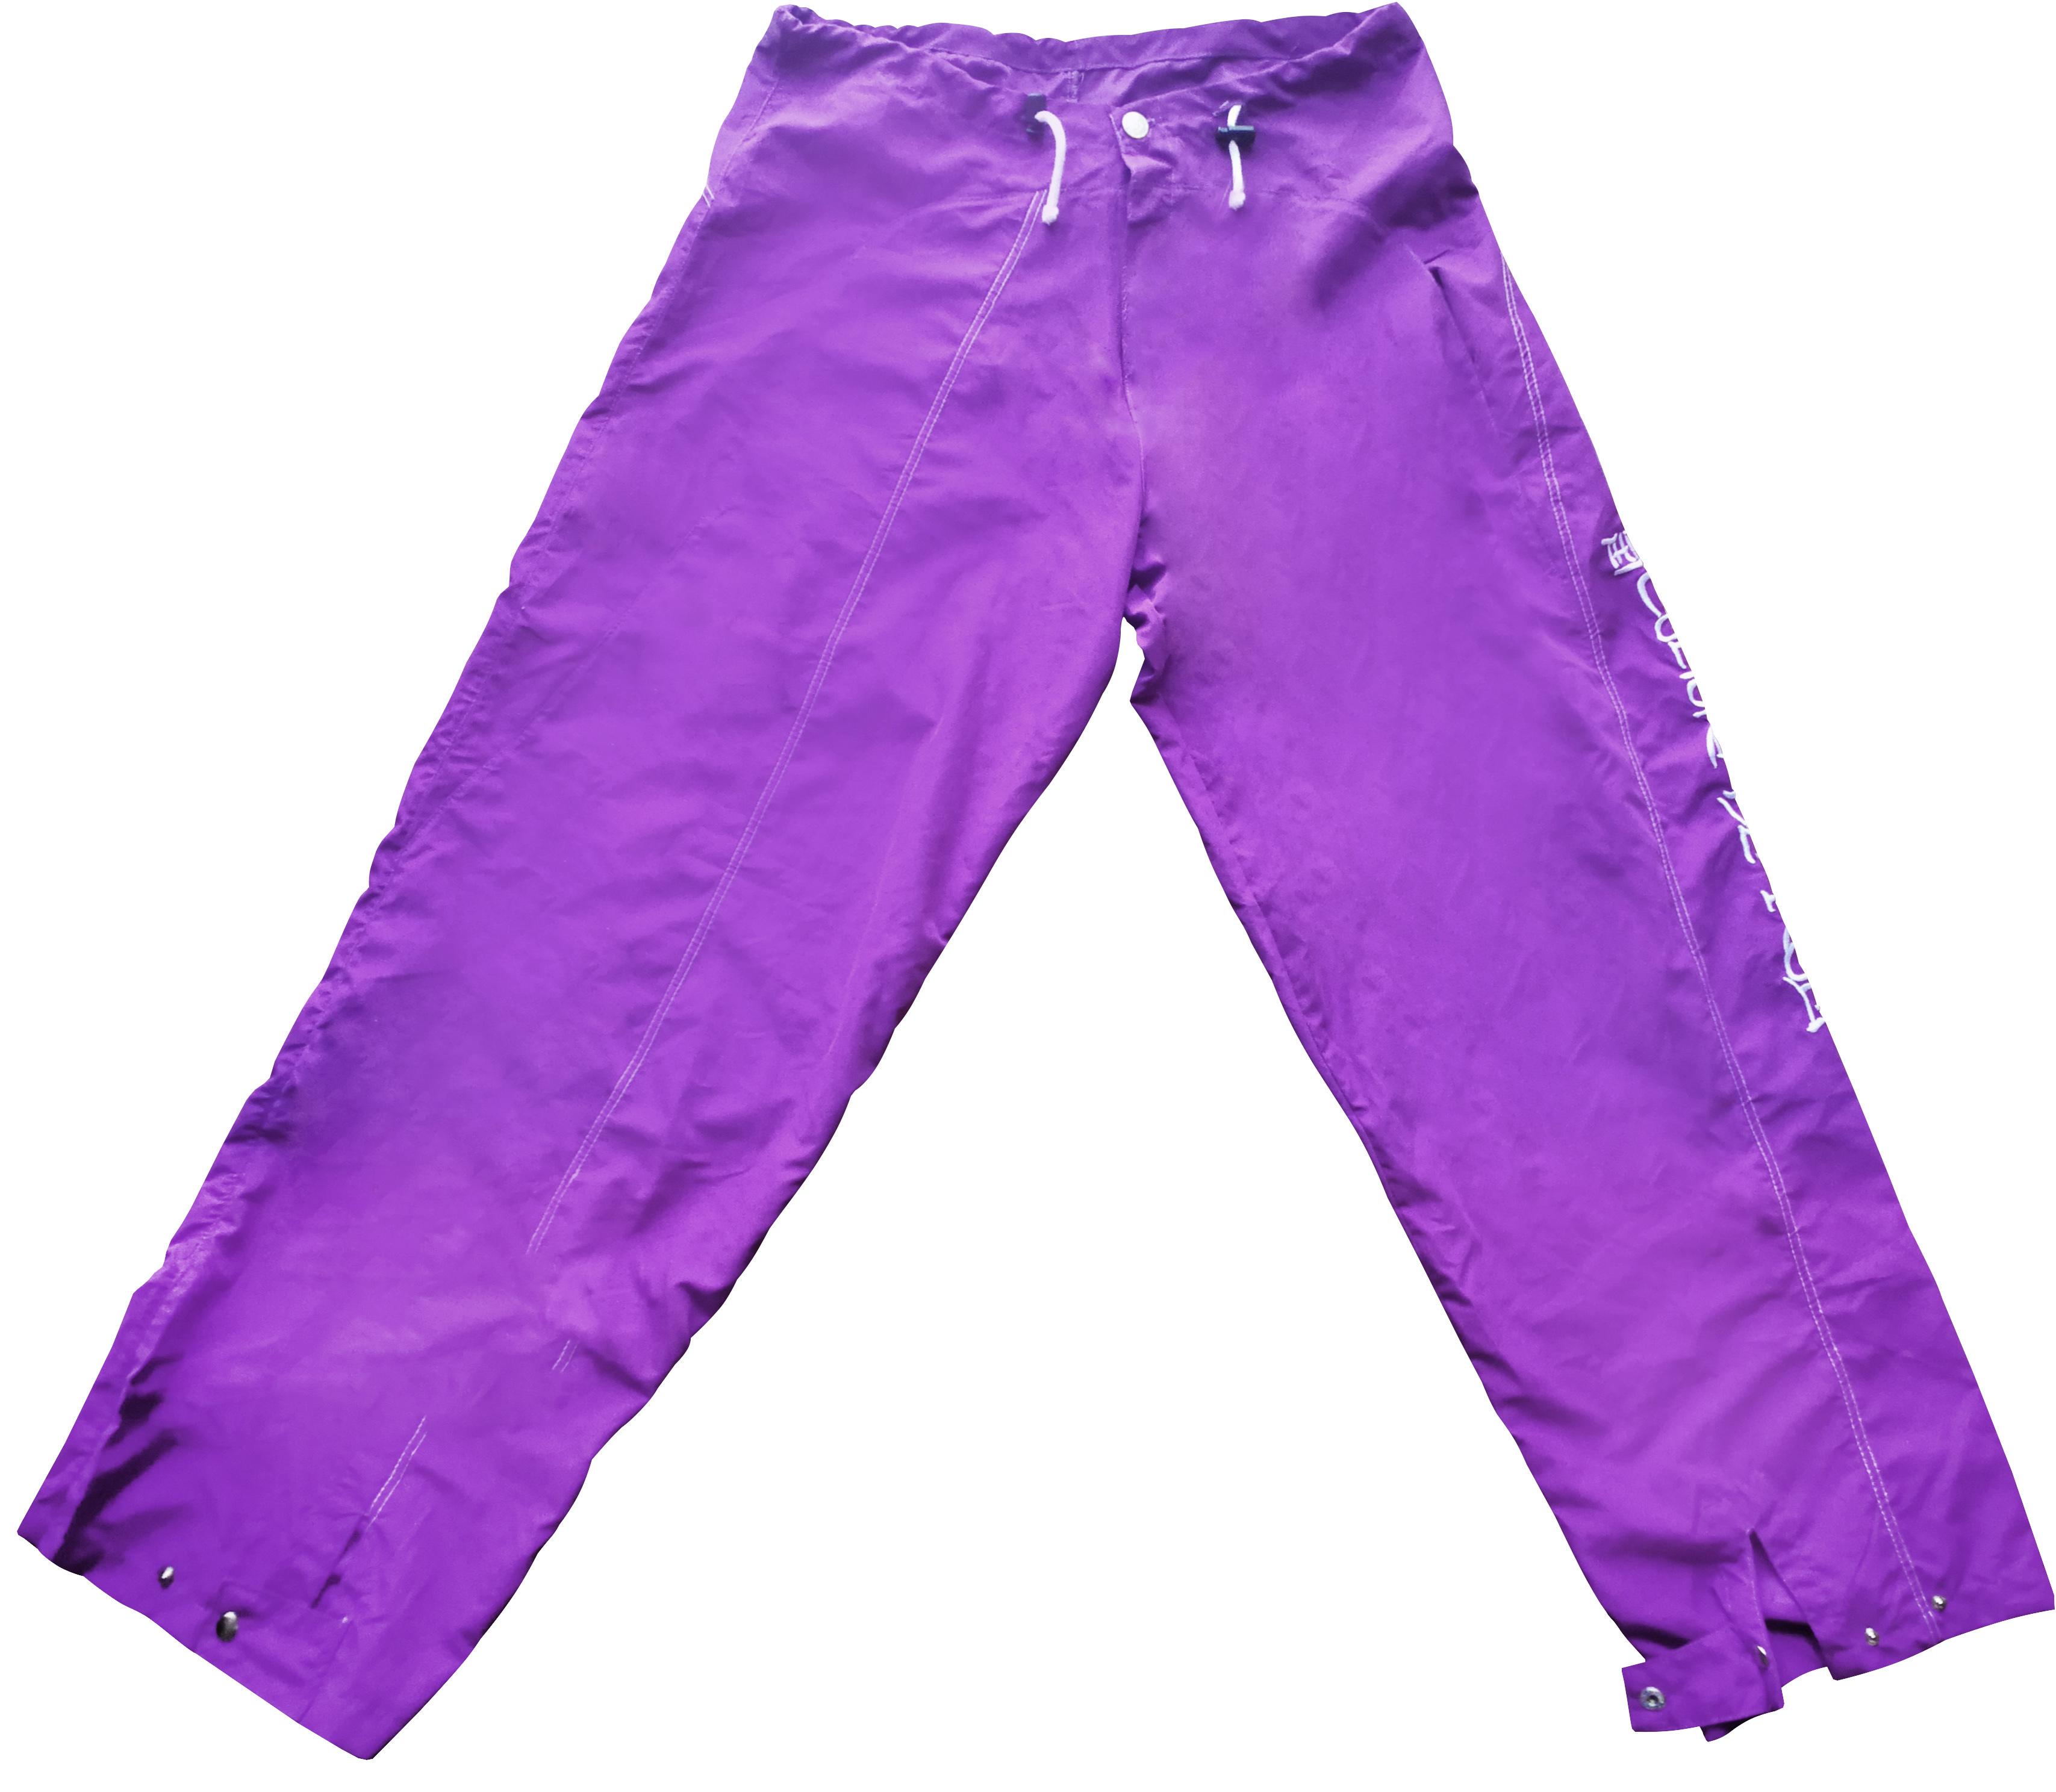 Unisex pants Samarak violet 00007